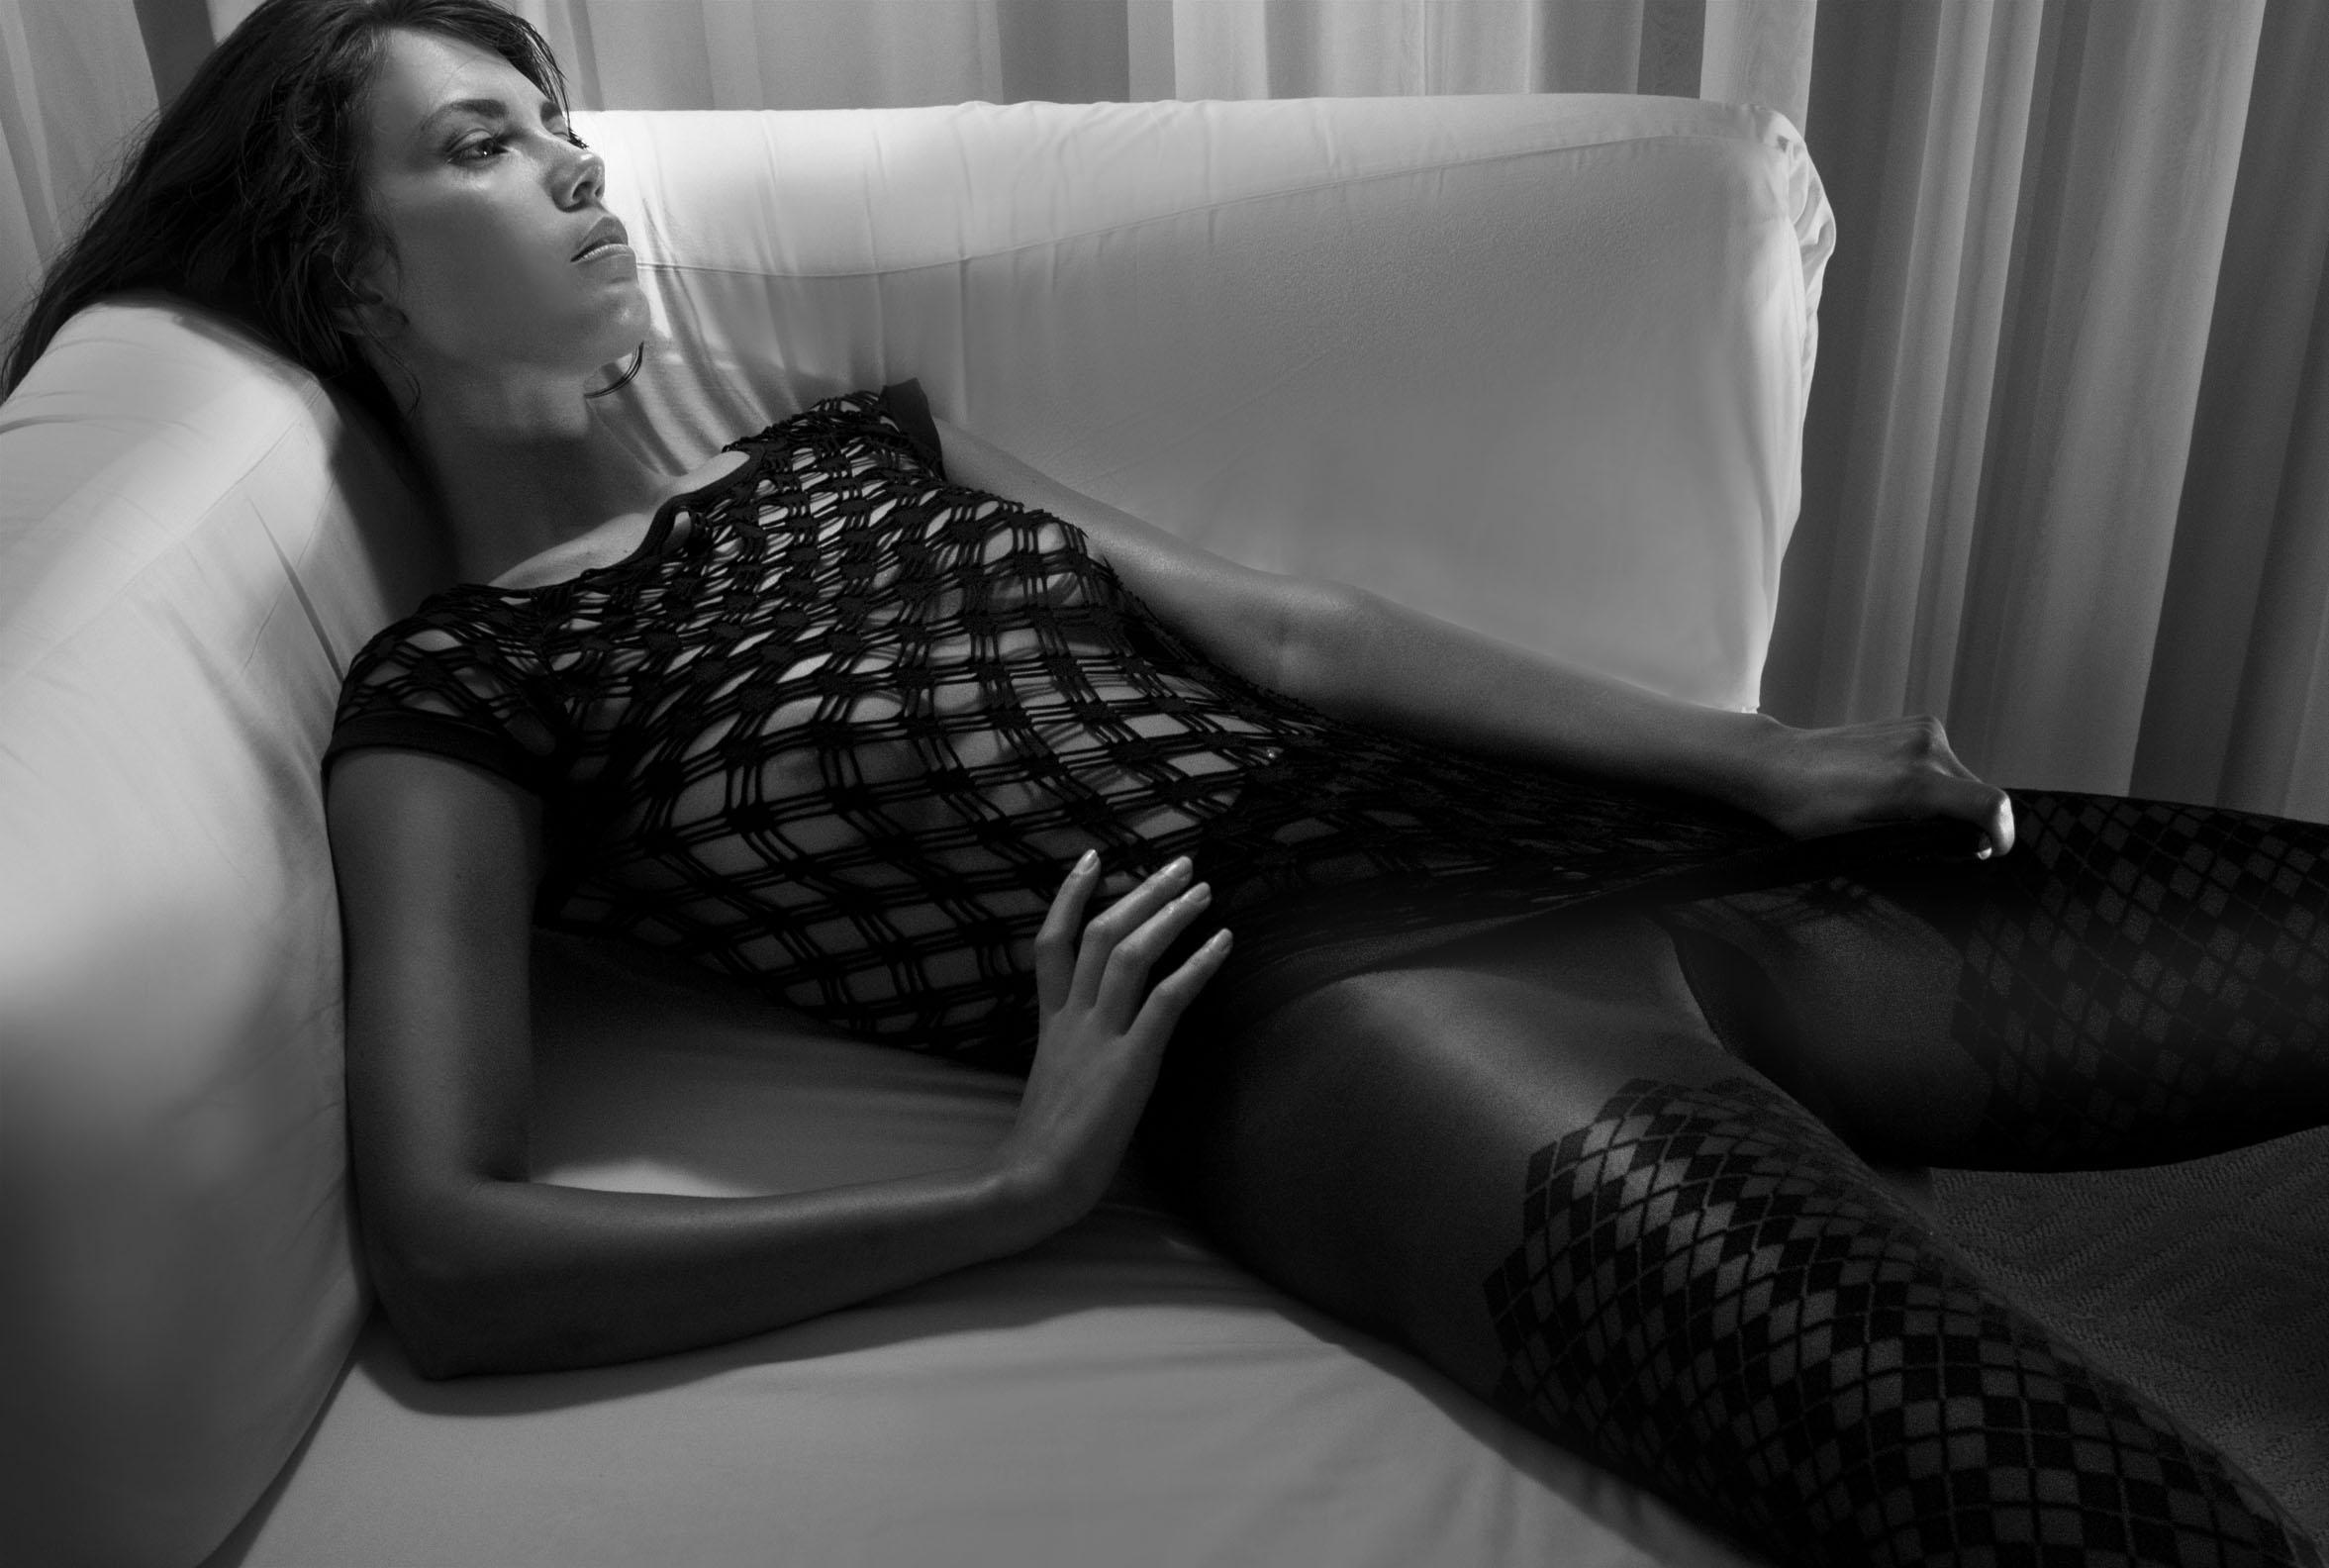 Feet Sabrina Janssen nudes (79 photos), Ass, Leaked, Twitter, swimsuit 2017